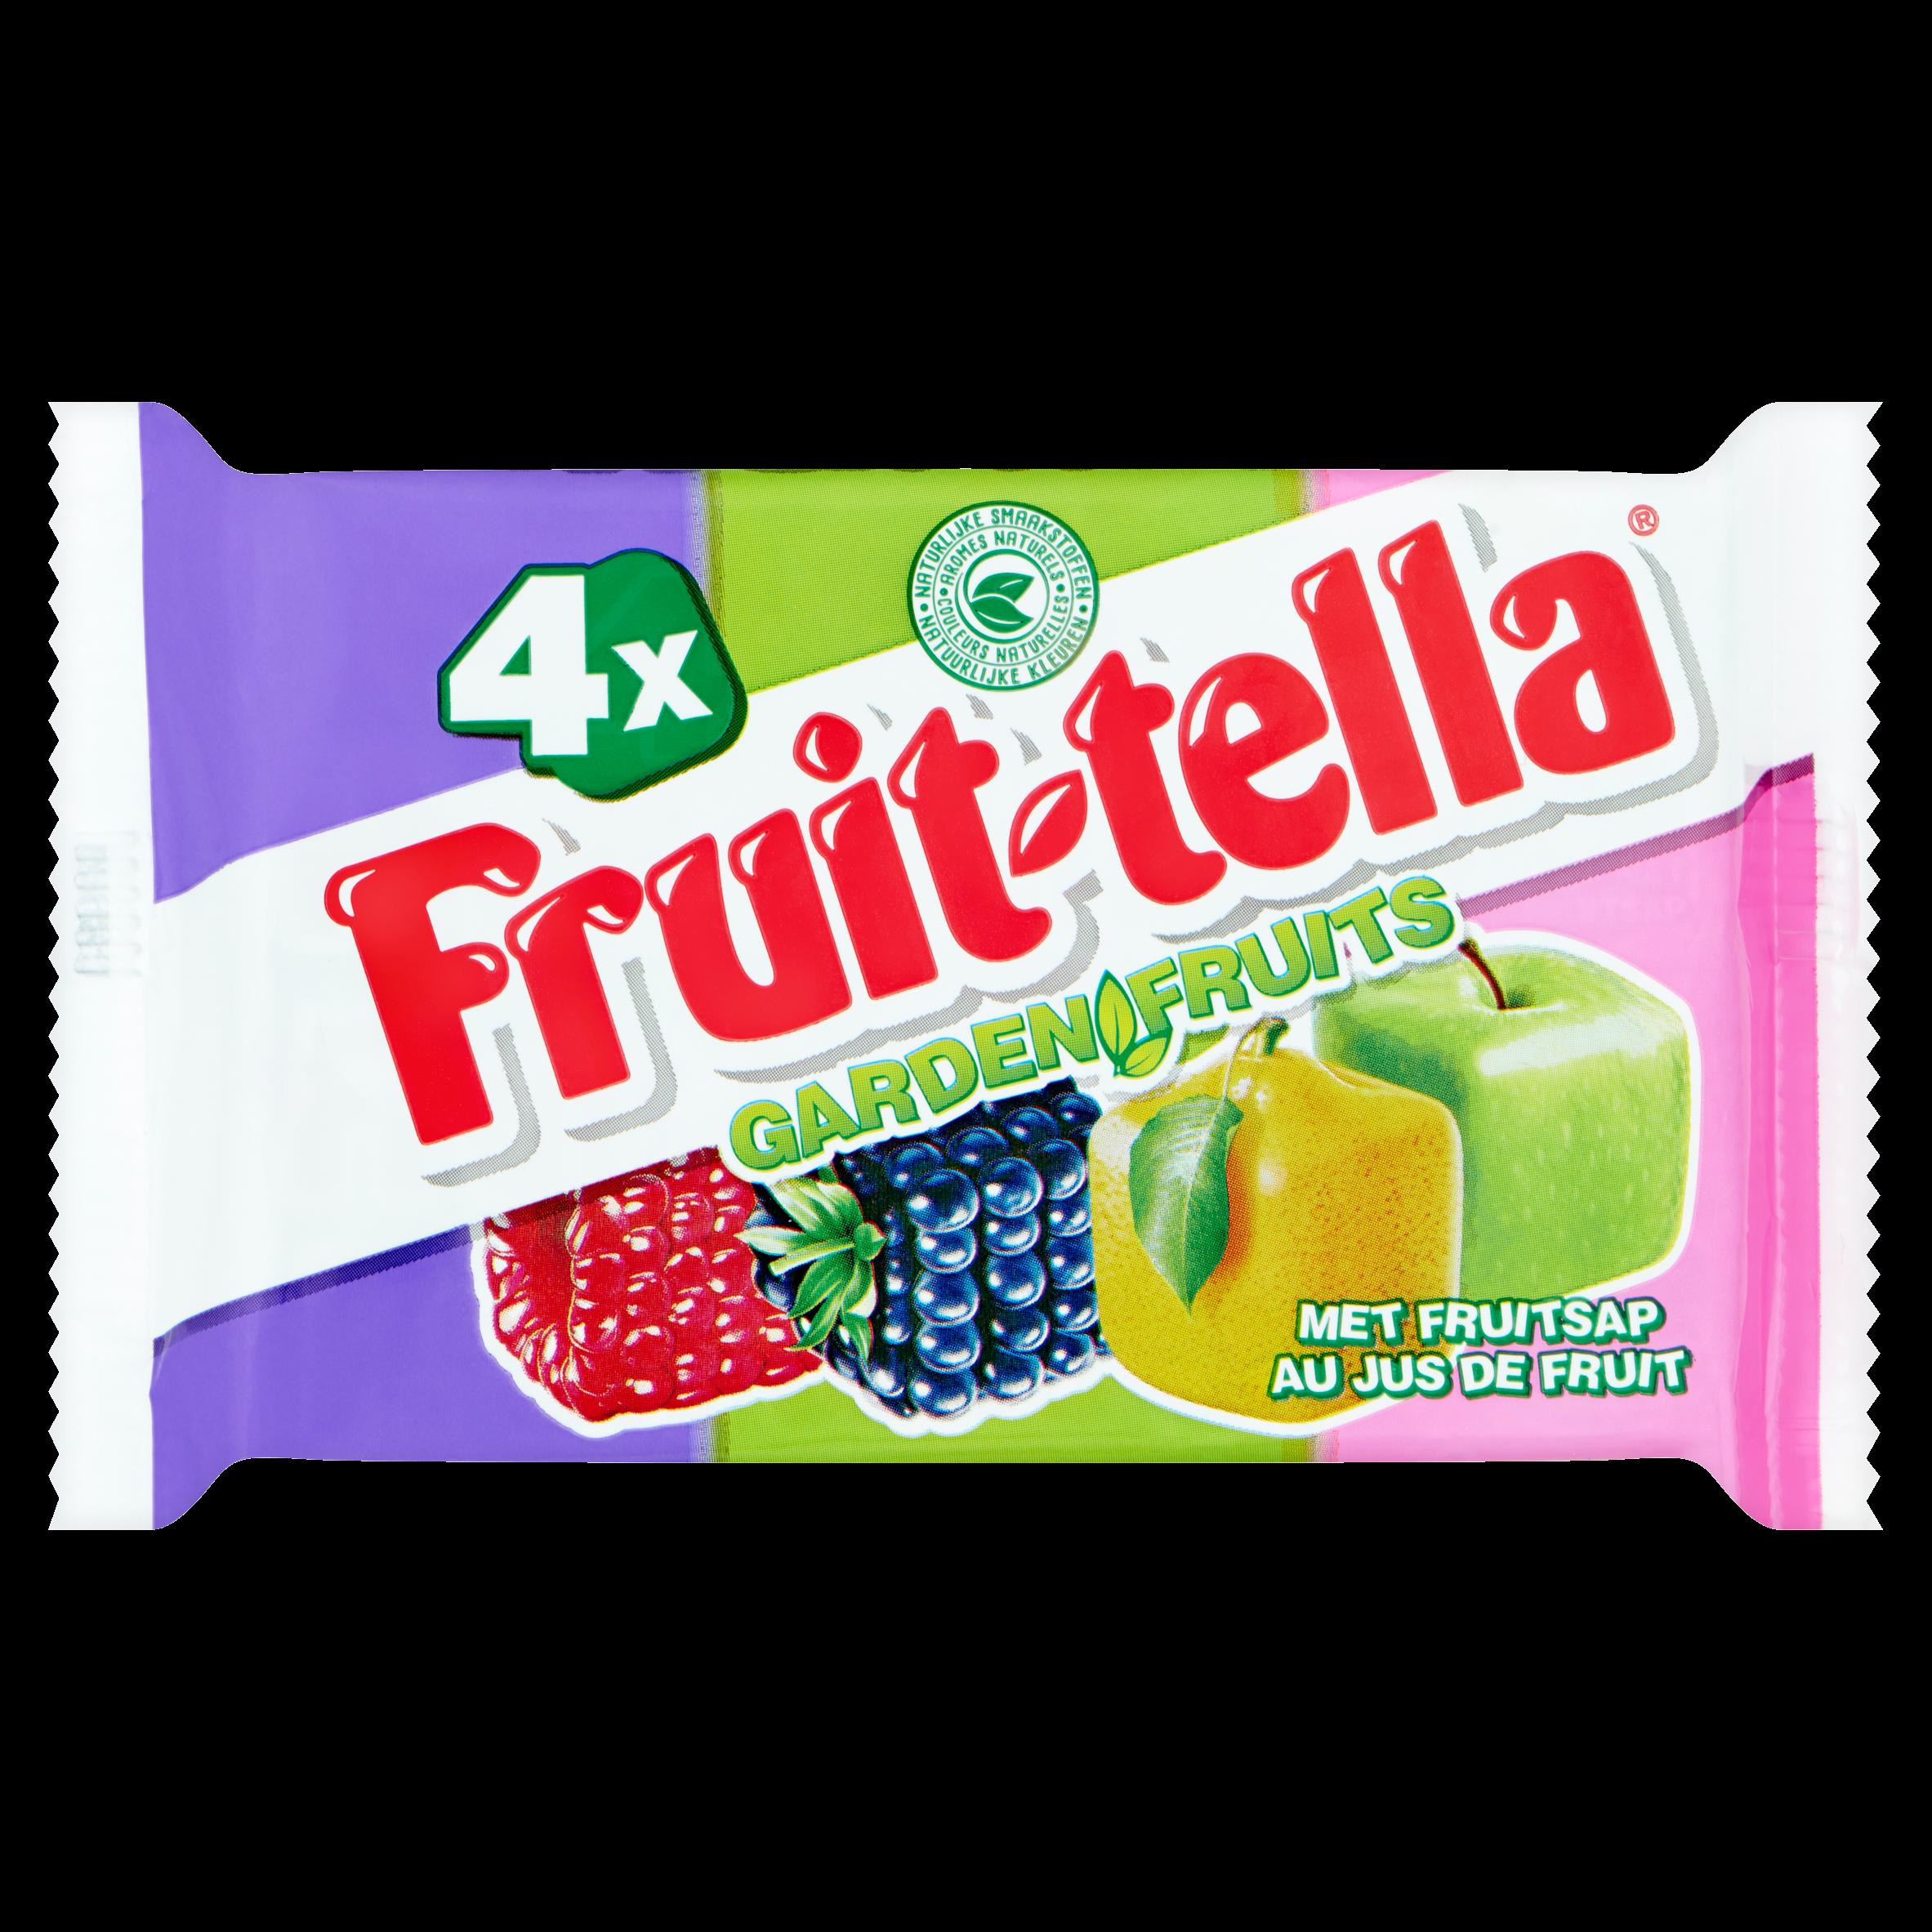 Fruittella Garden Fruits 4 x 41 g